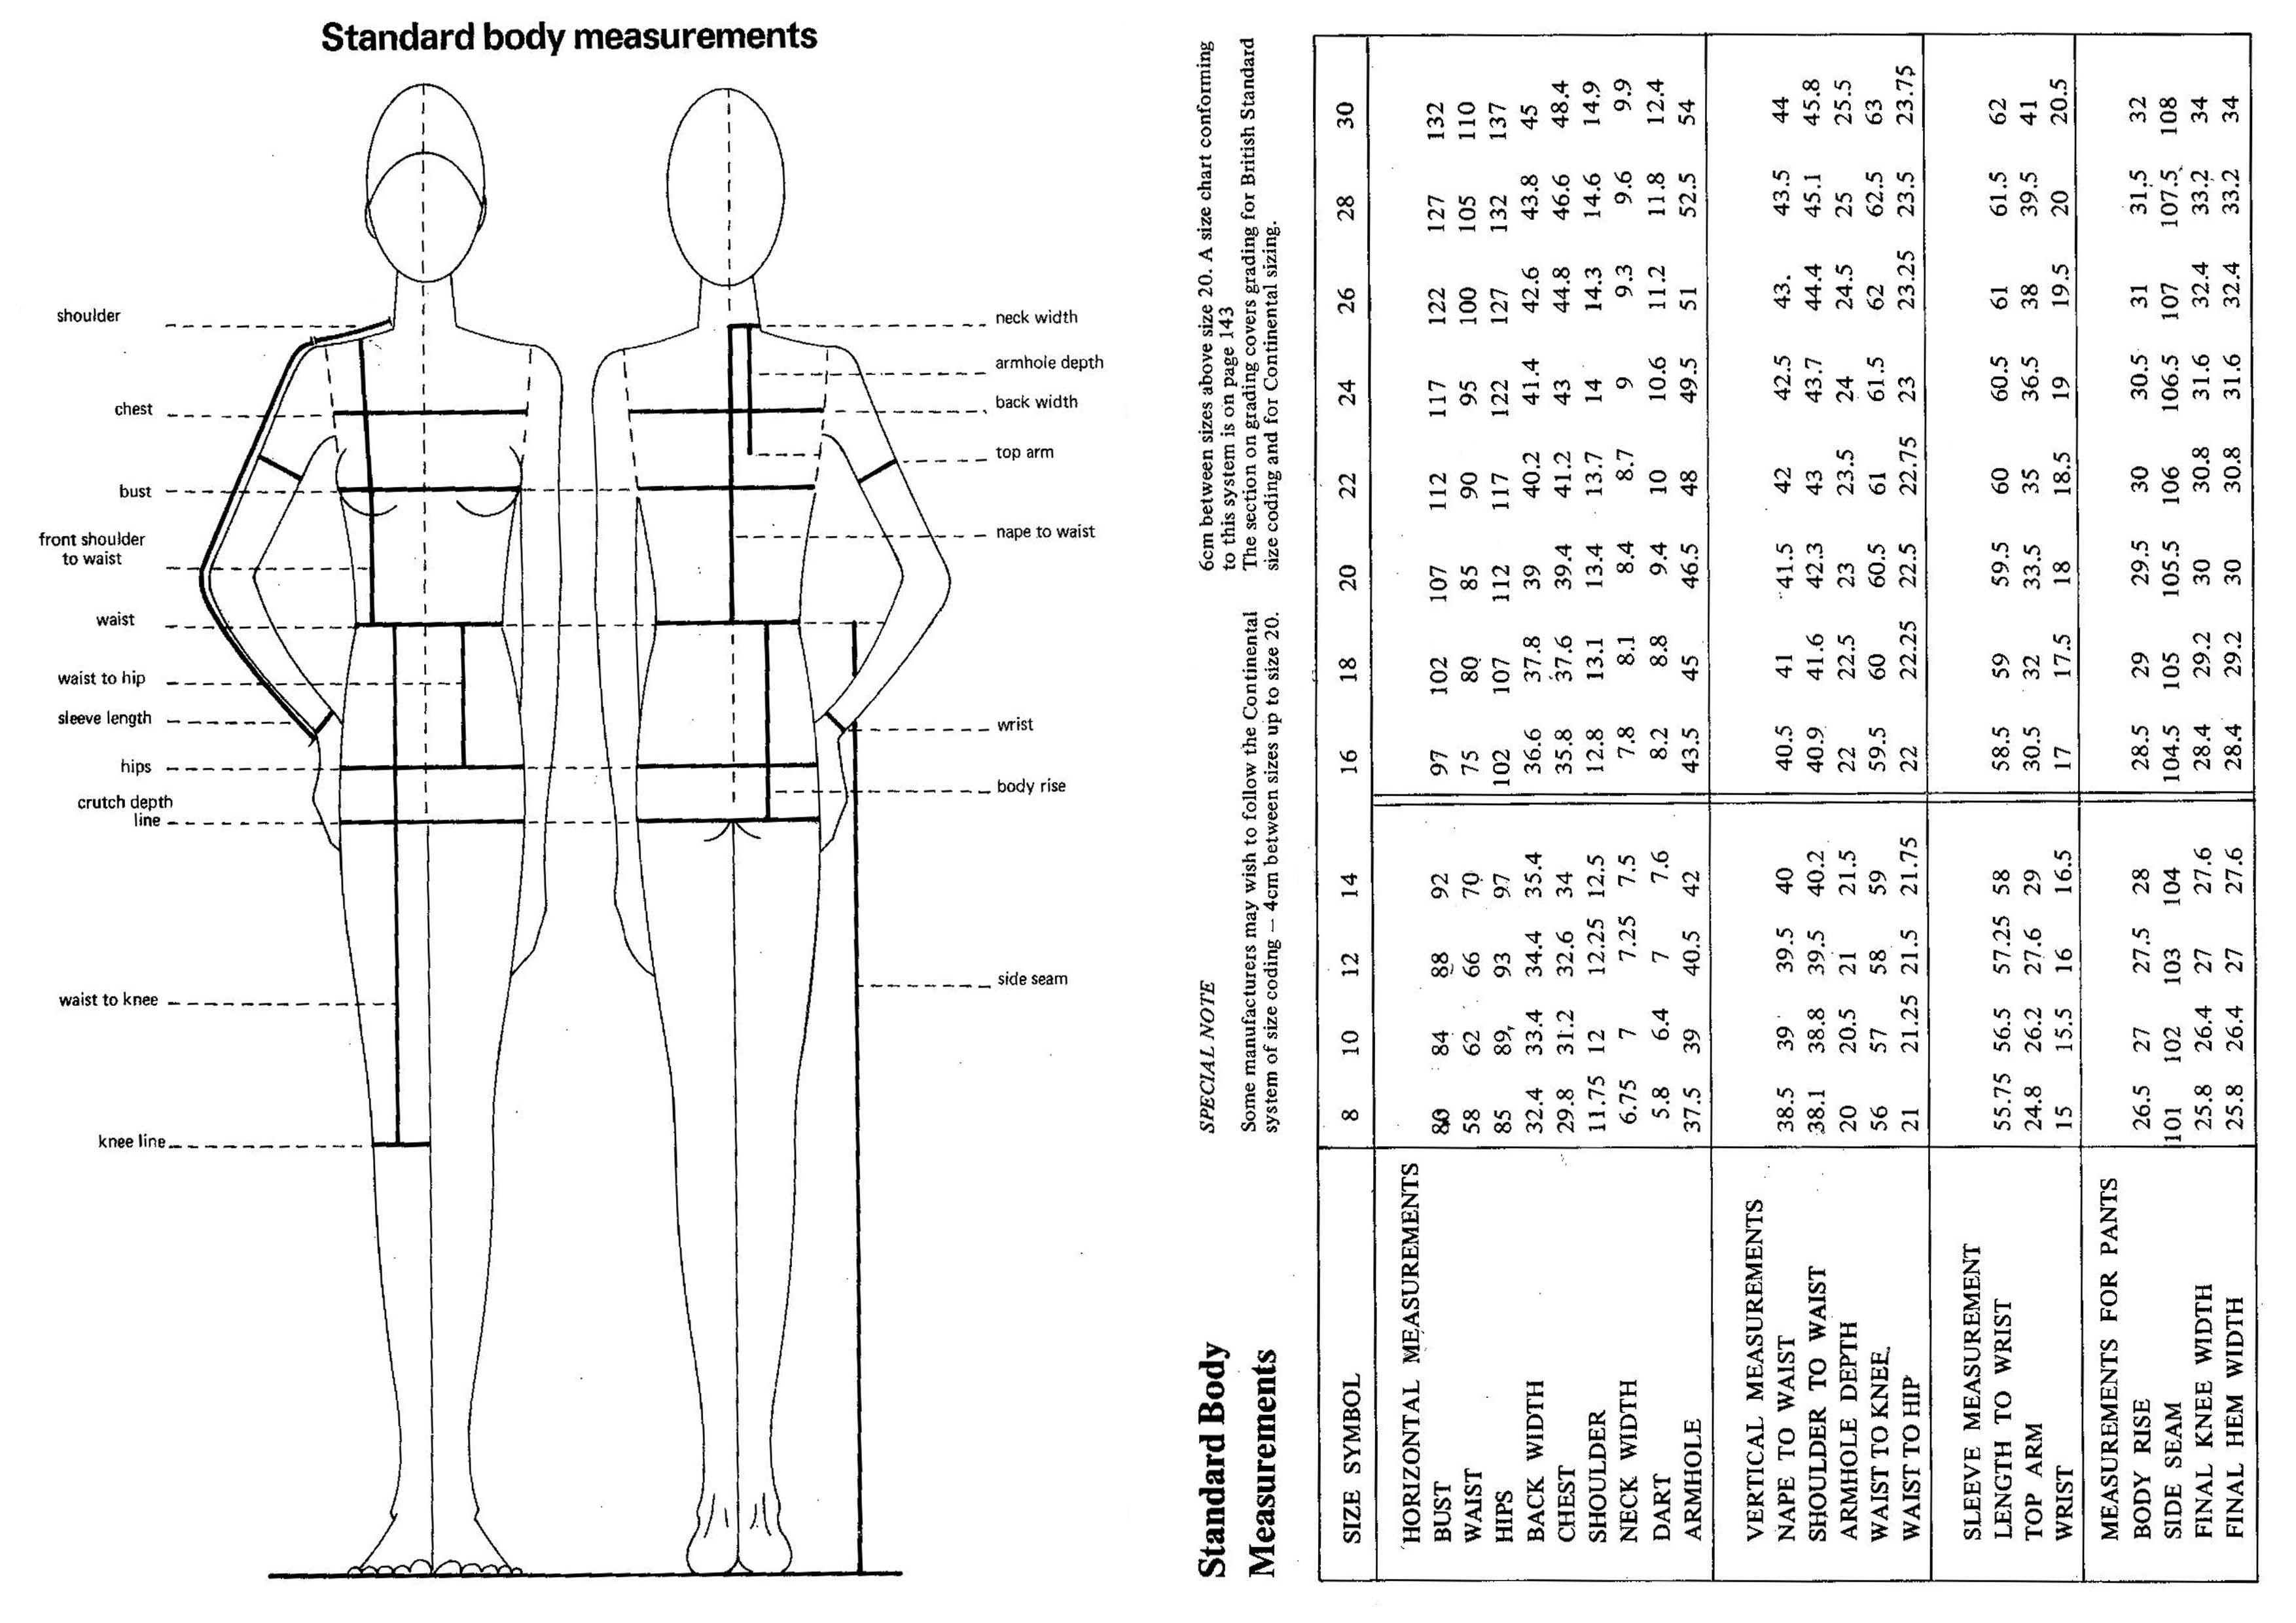 Standard Body Measurements